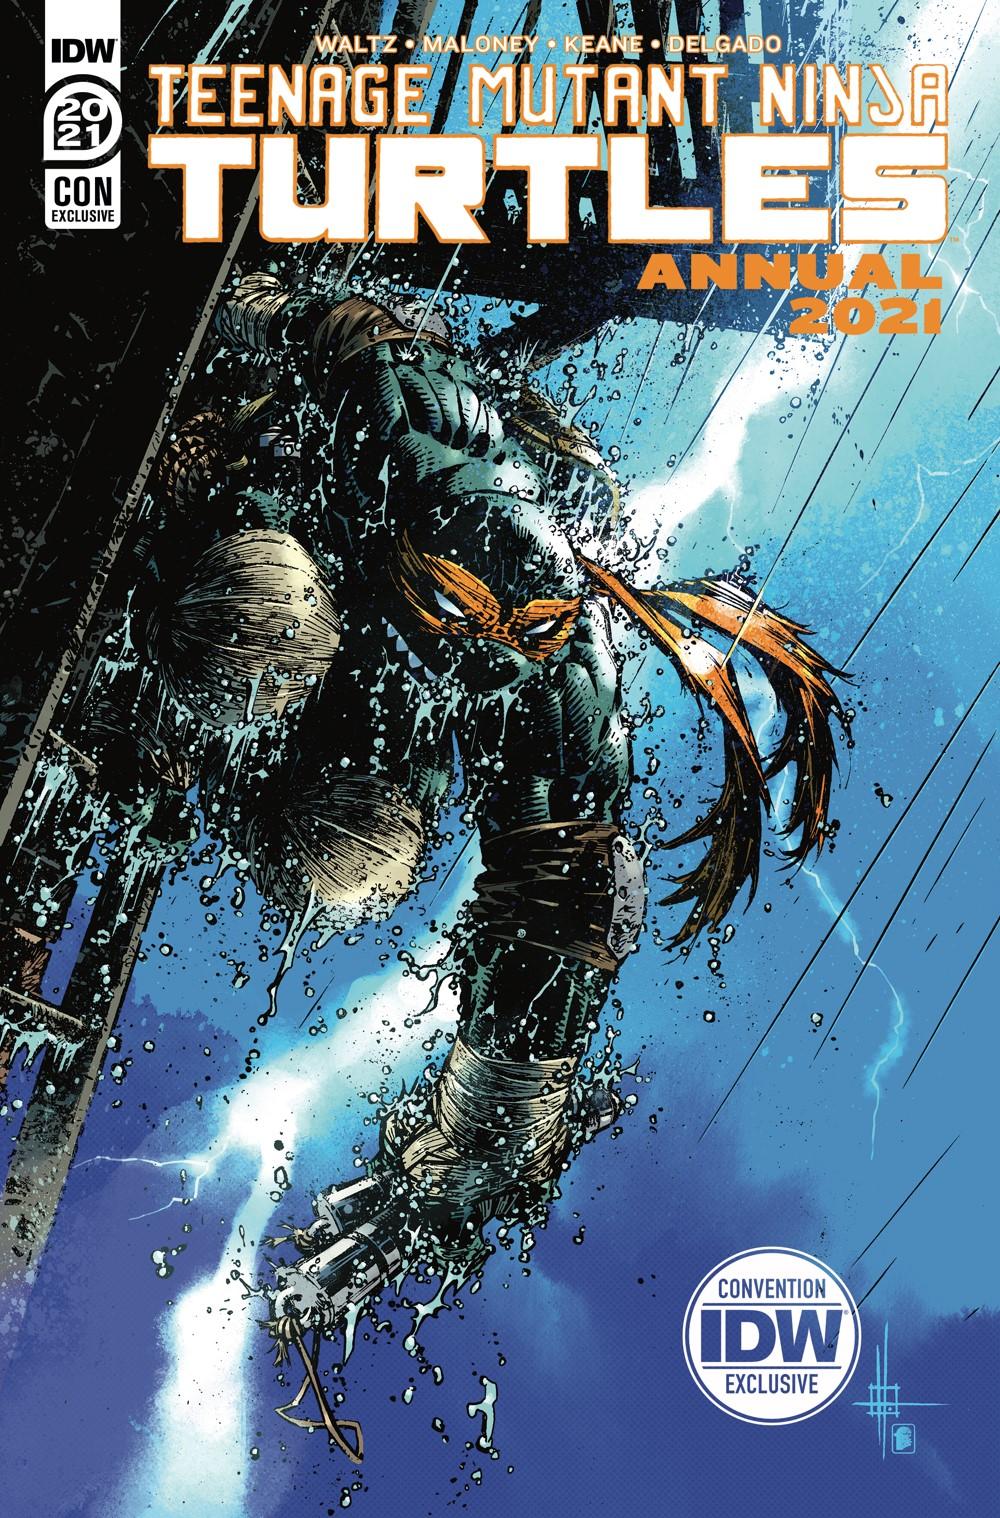 TMNT-Annual2021_cvrCON ComicList Previews: TEENAGE MUTANT NINJA TURTLES ANNUAL 2021